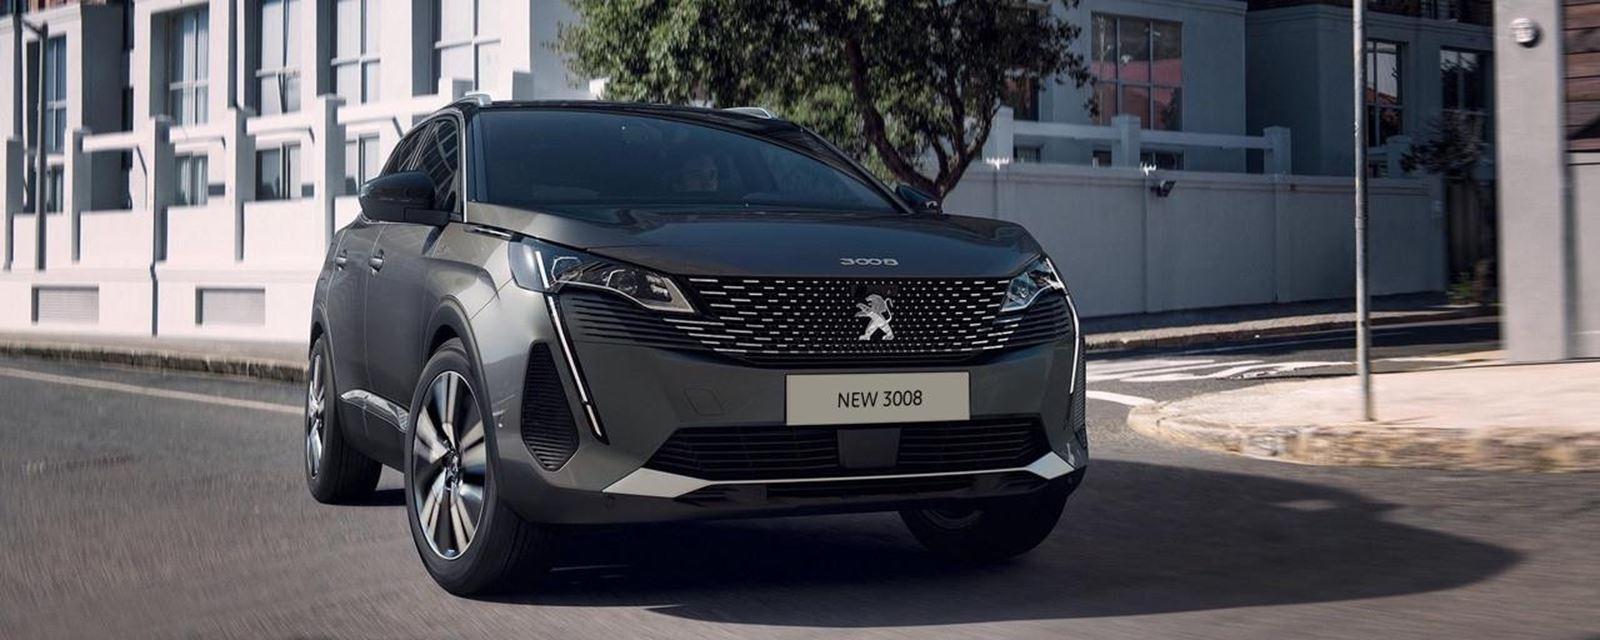 New Peugeot 3008 SUV